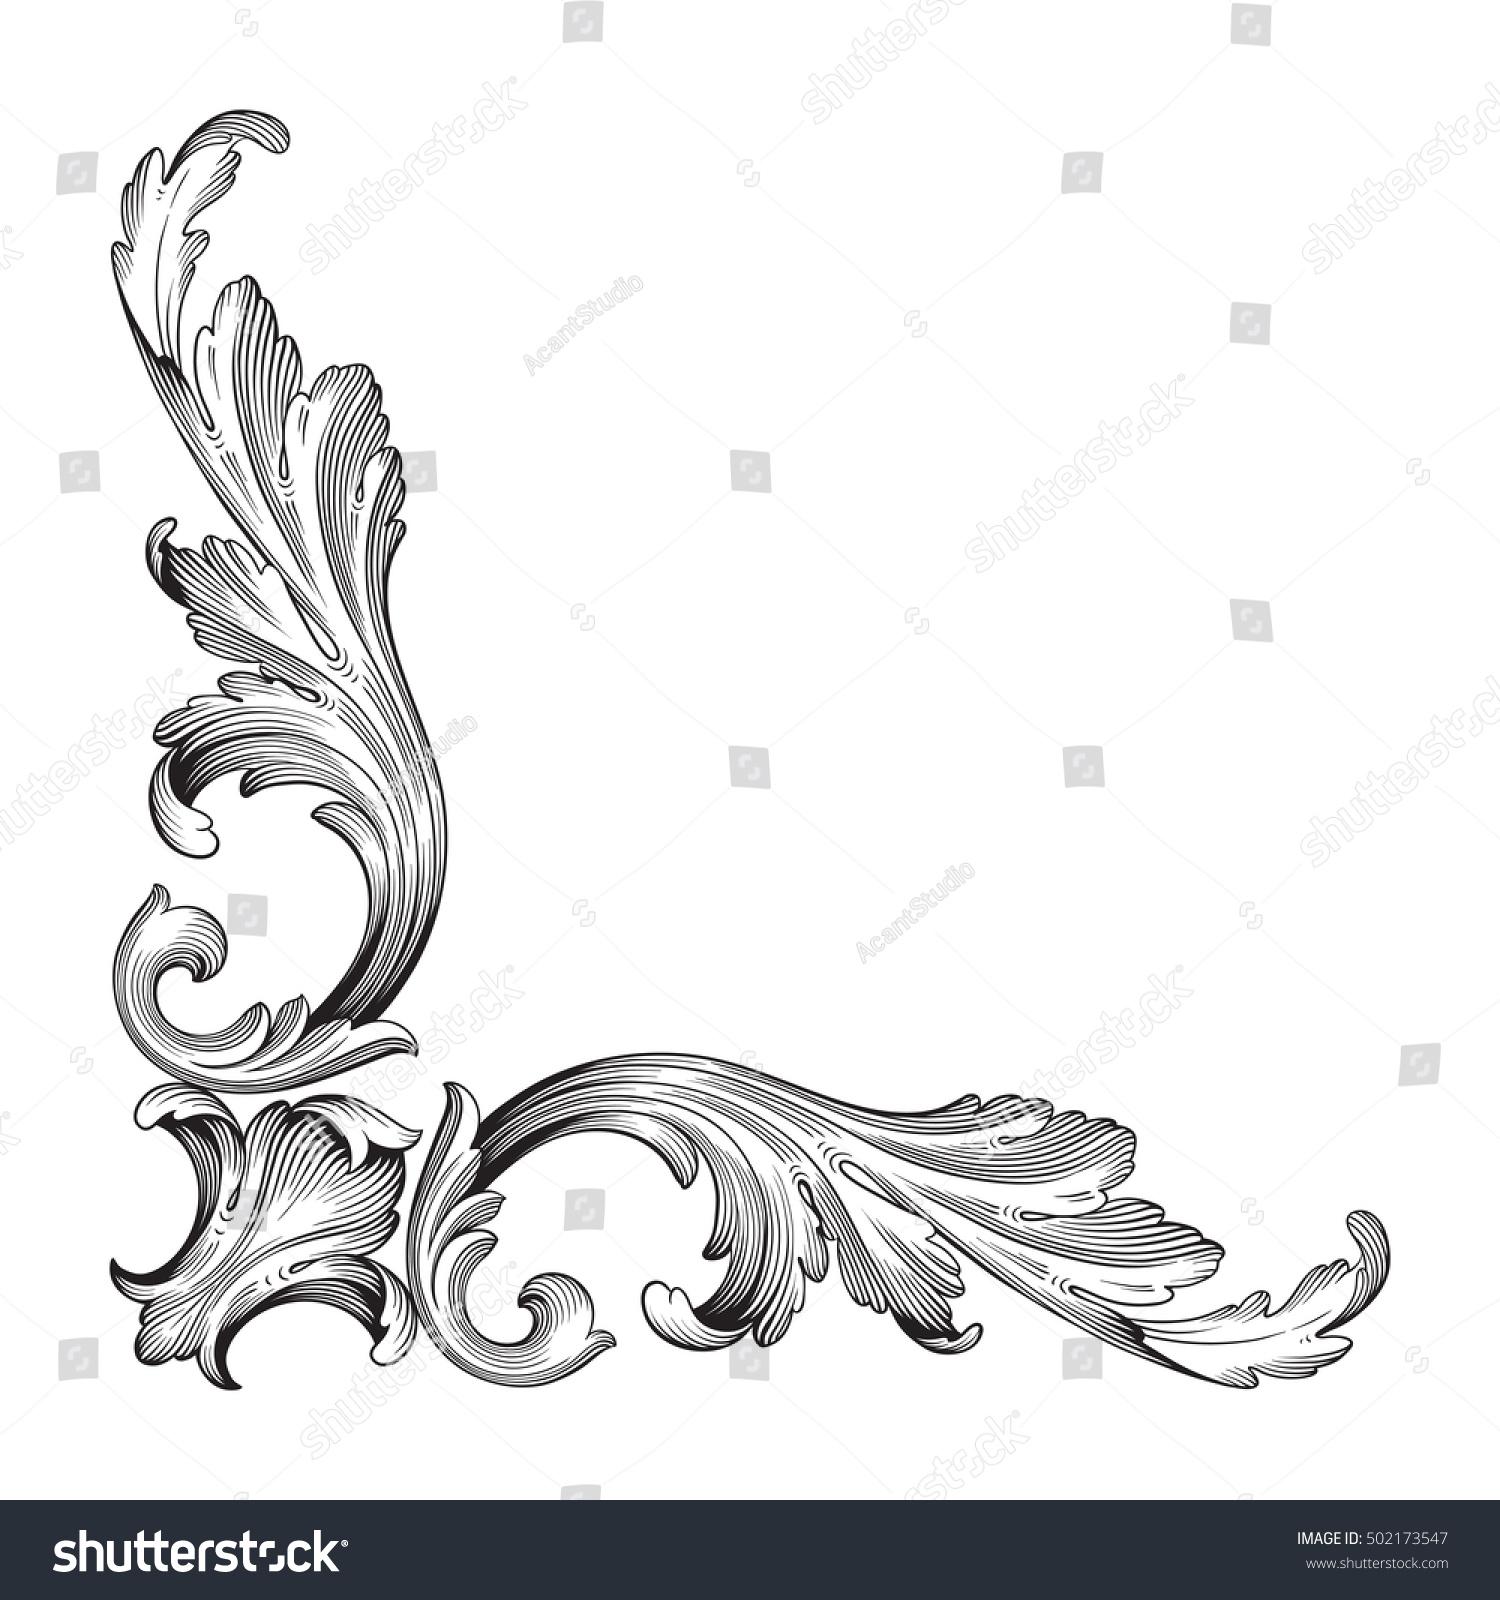 Corner Scroll Designs: Vintage Baroque Corner Scroll Ornament Engraving Stock